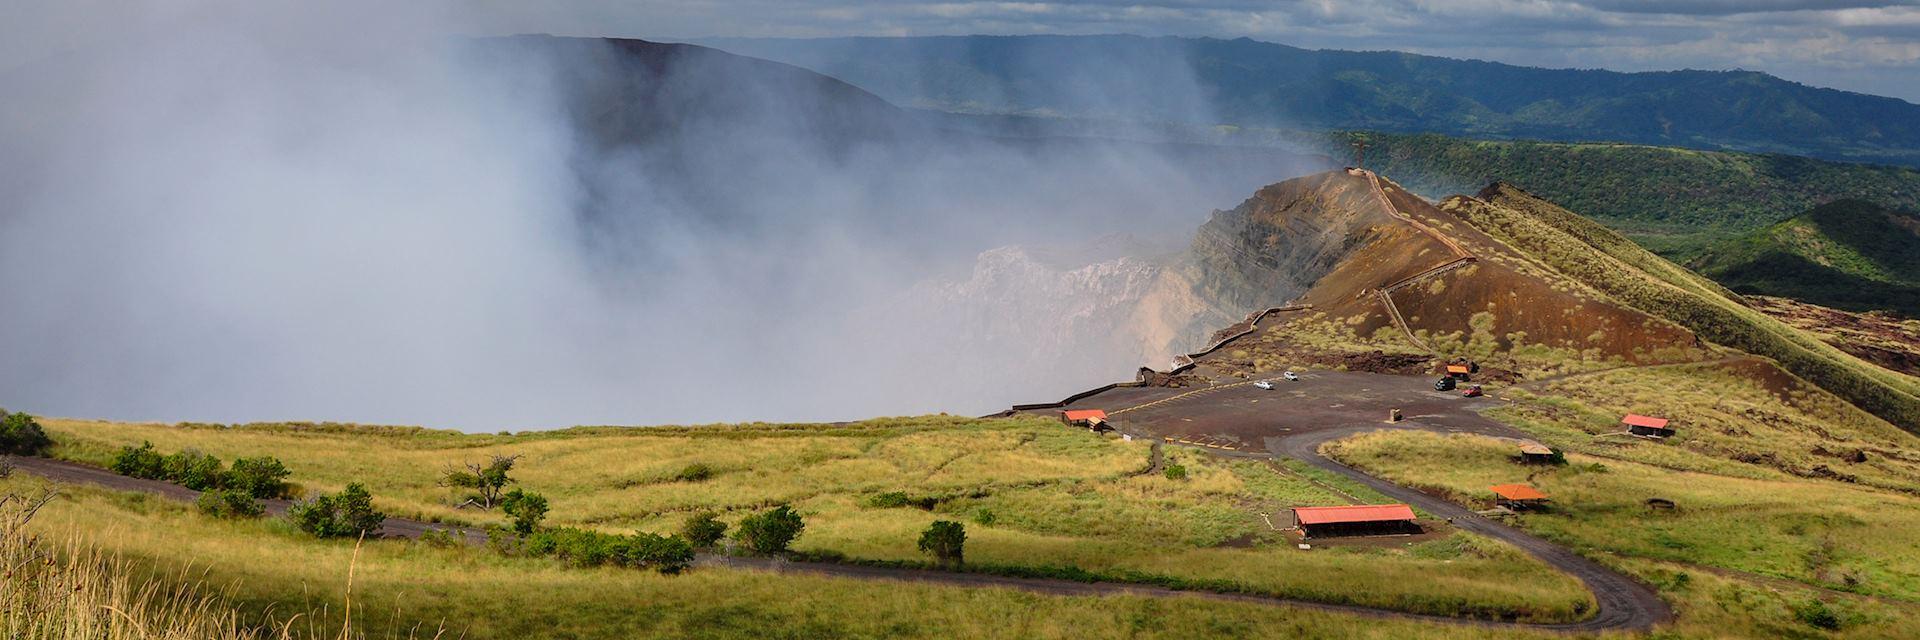 Masaya Volcano National Park, Nicaragua